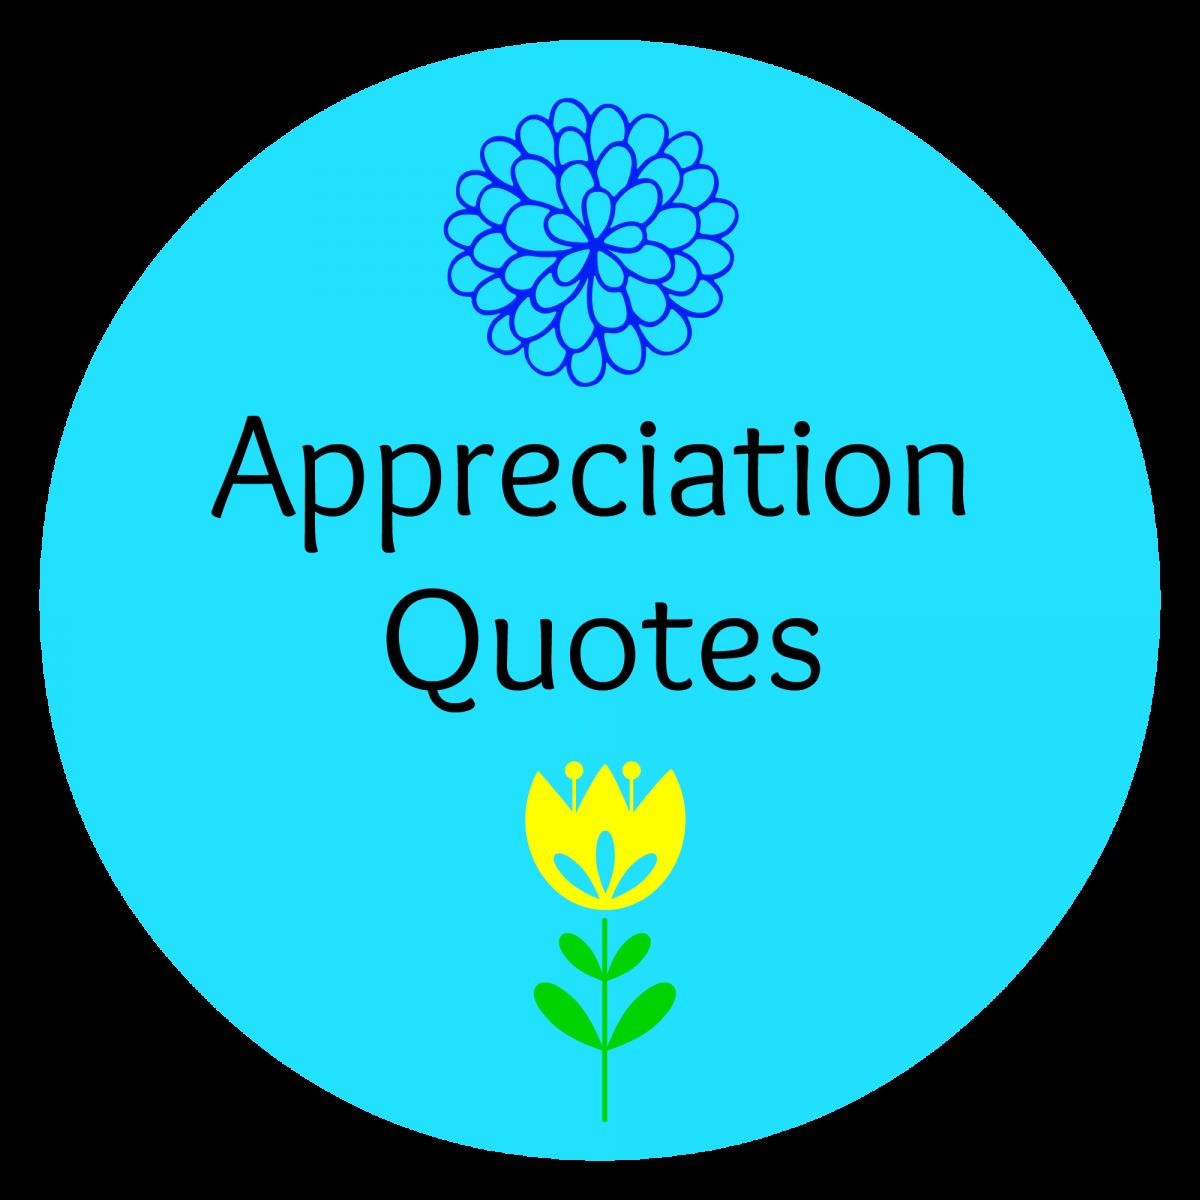 Appreciation Quotes: Best Quotes - Appreciation